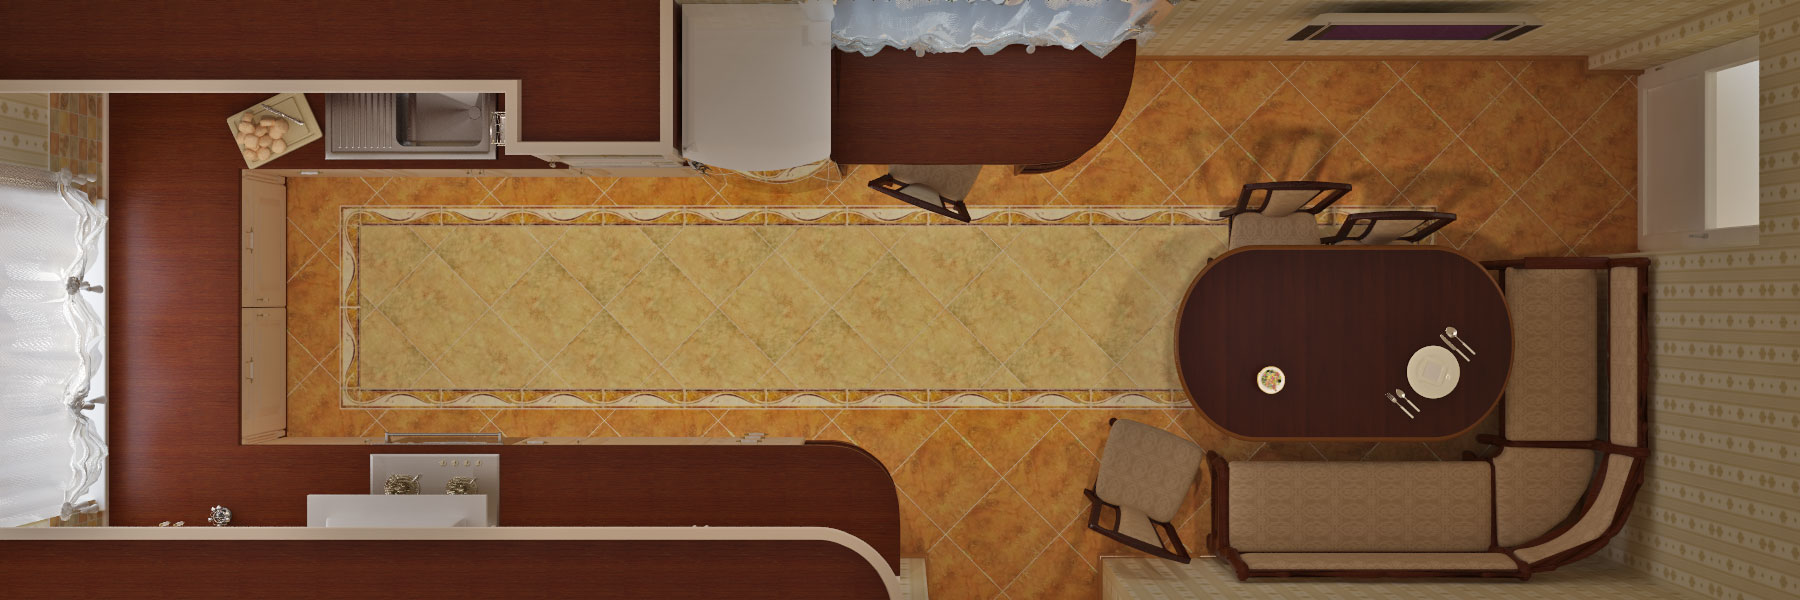 план узкой кухни